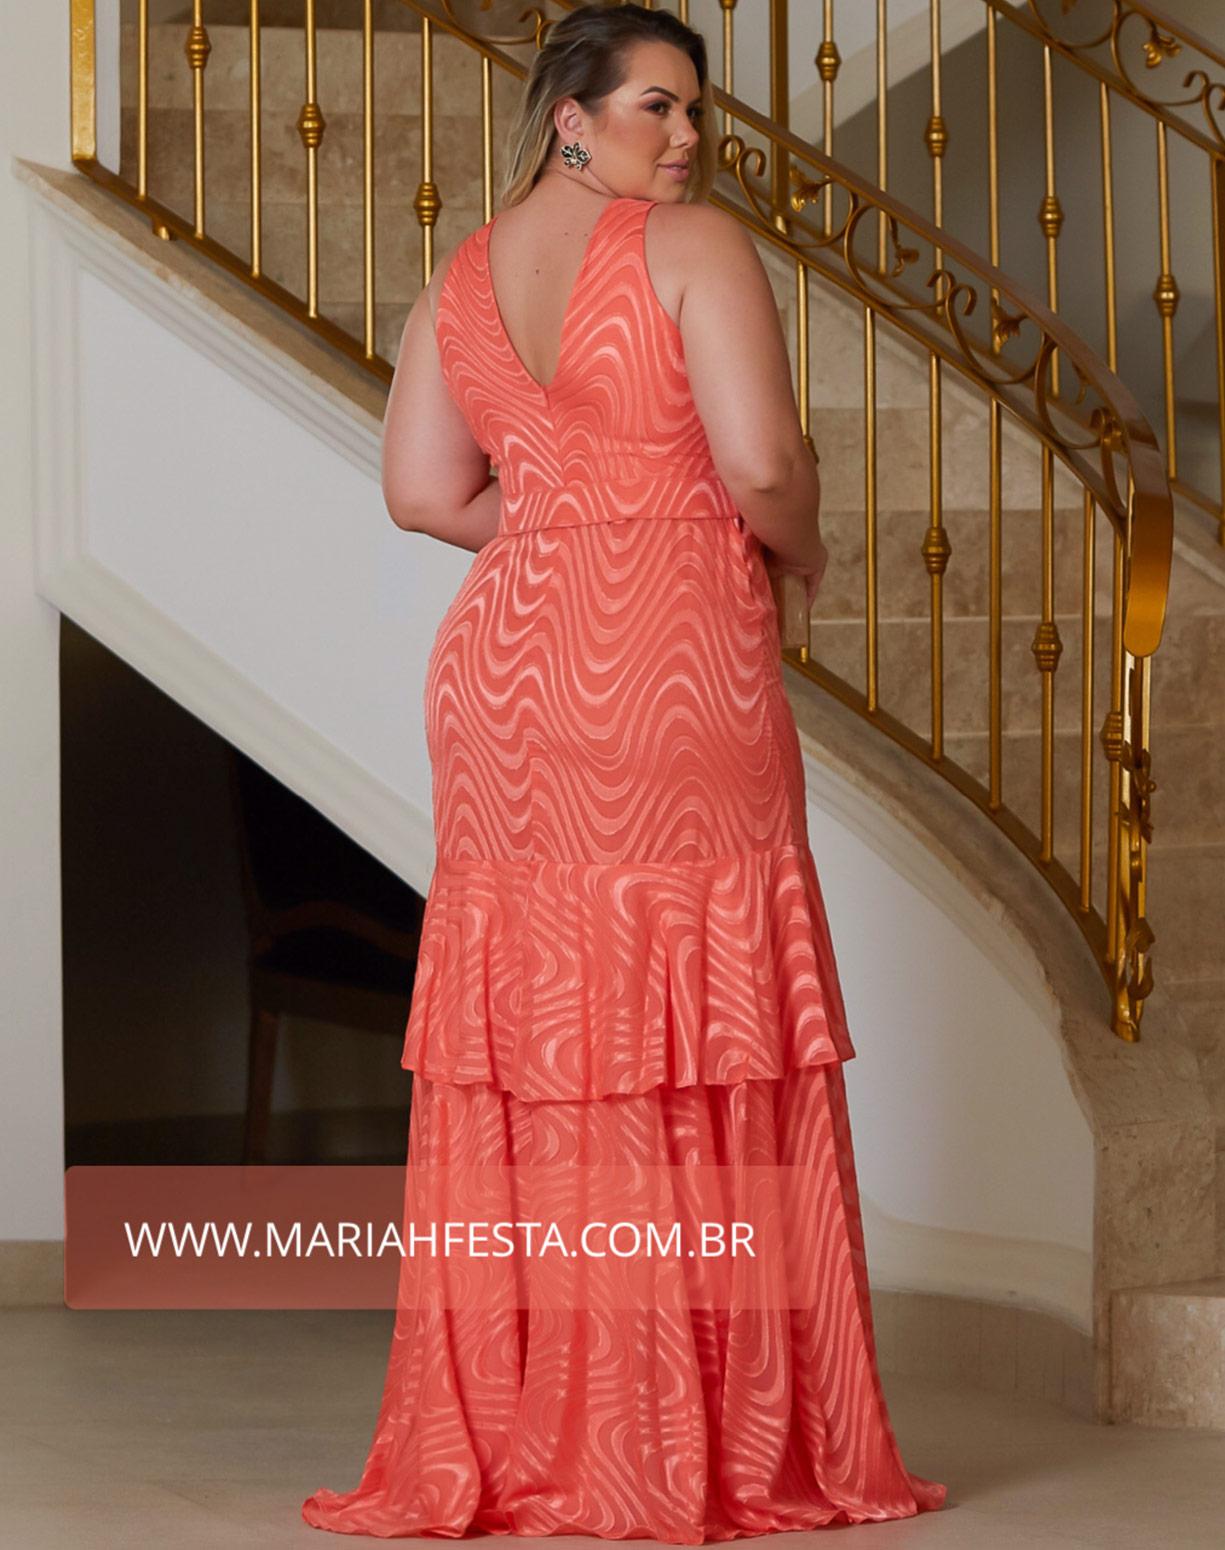 Vestido Coral em Musseline Texturizado